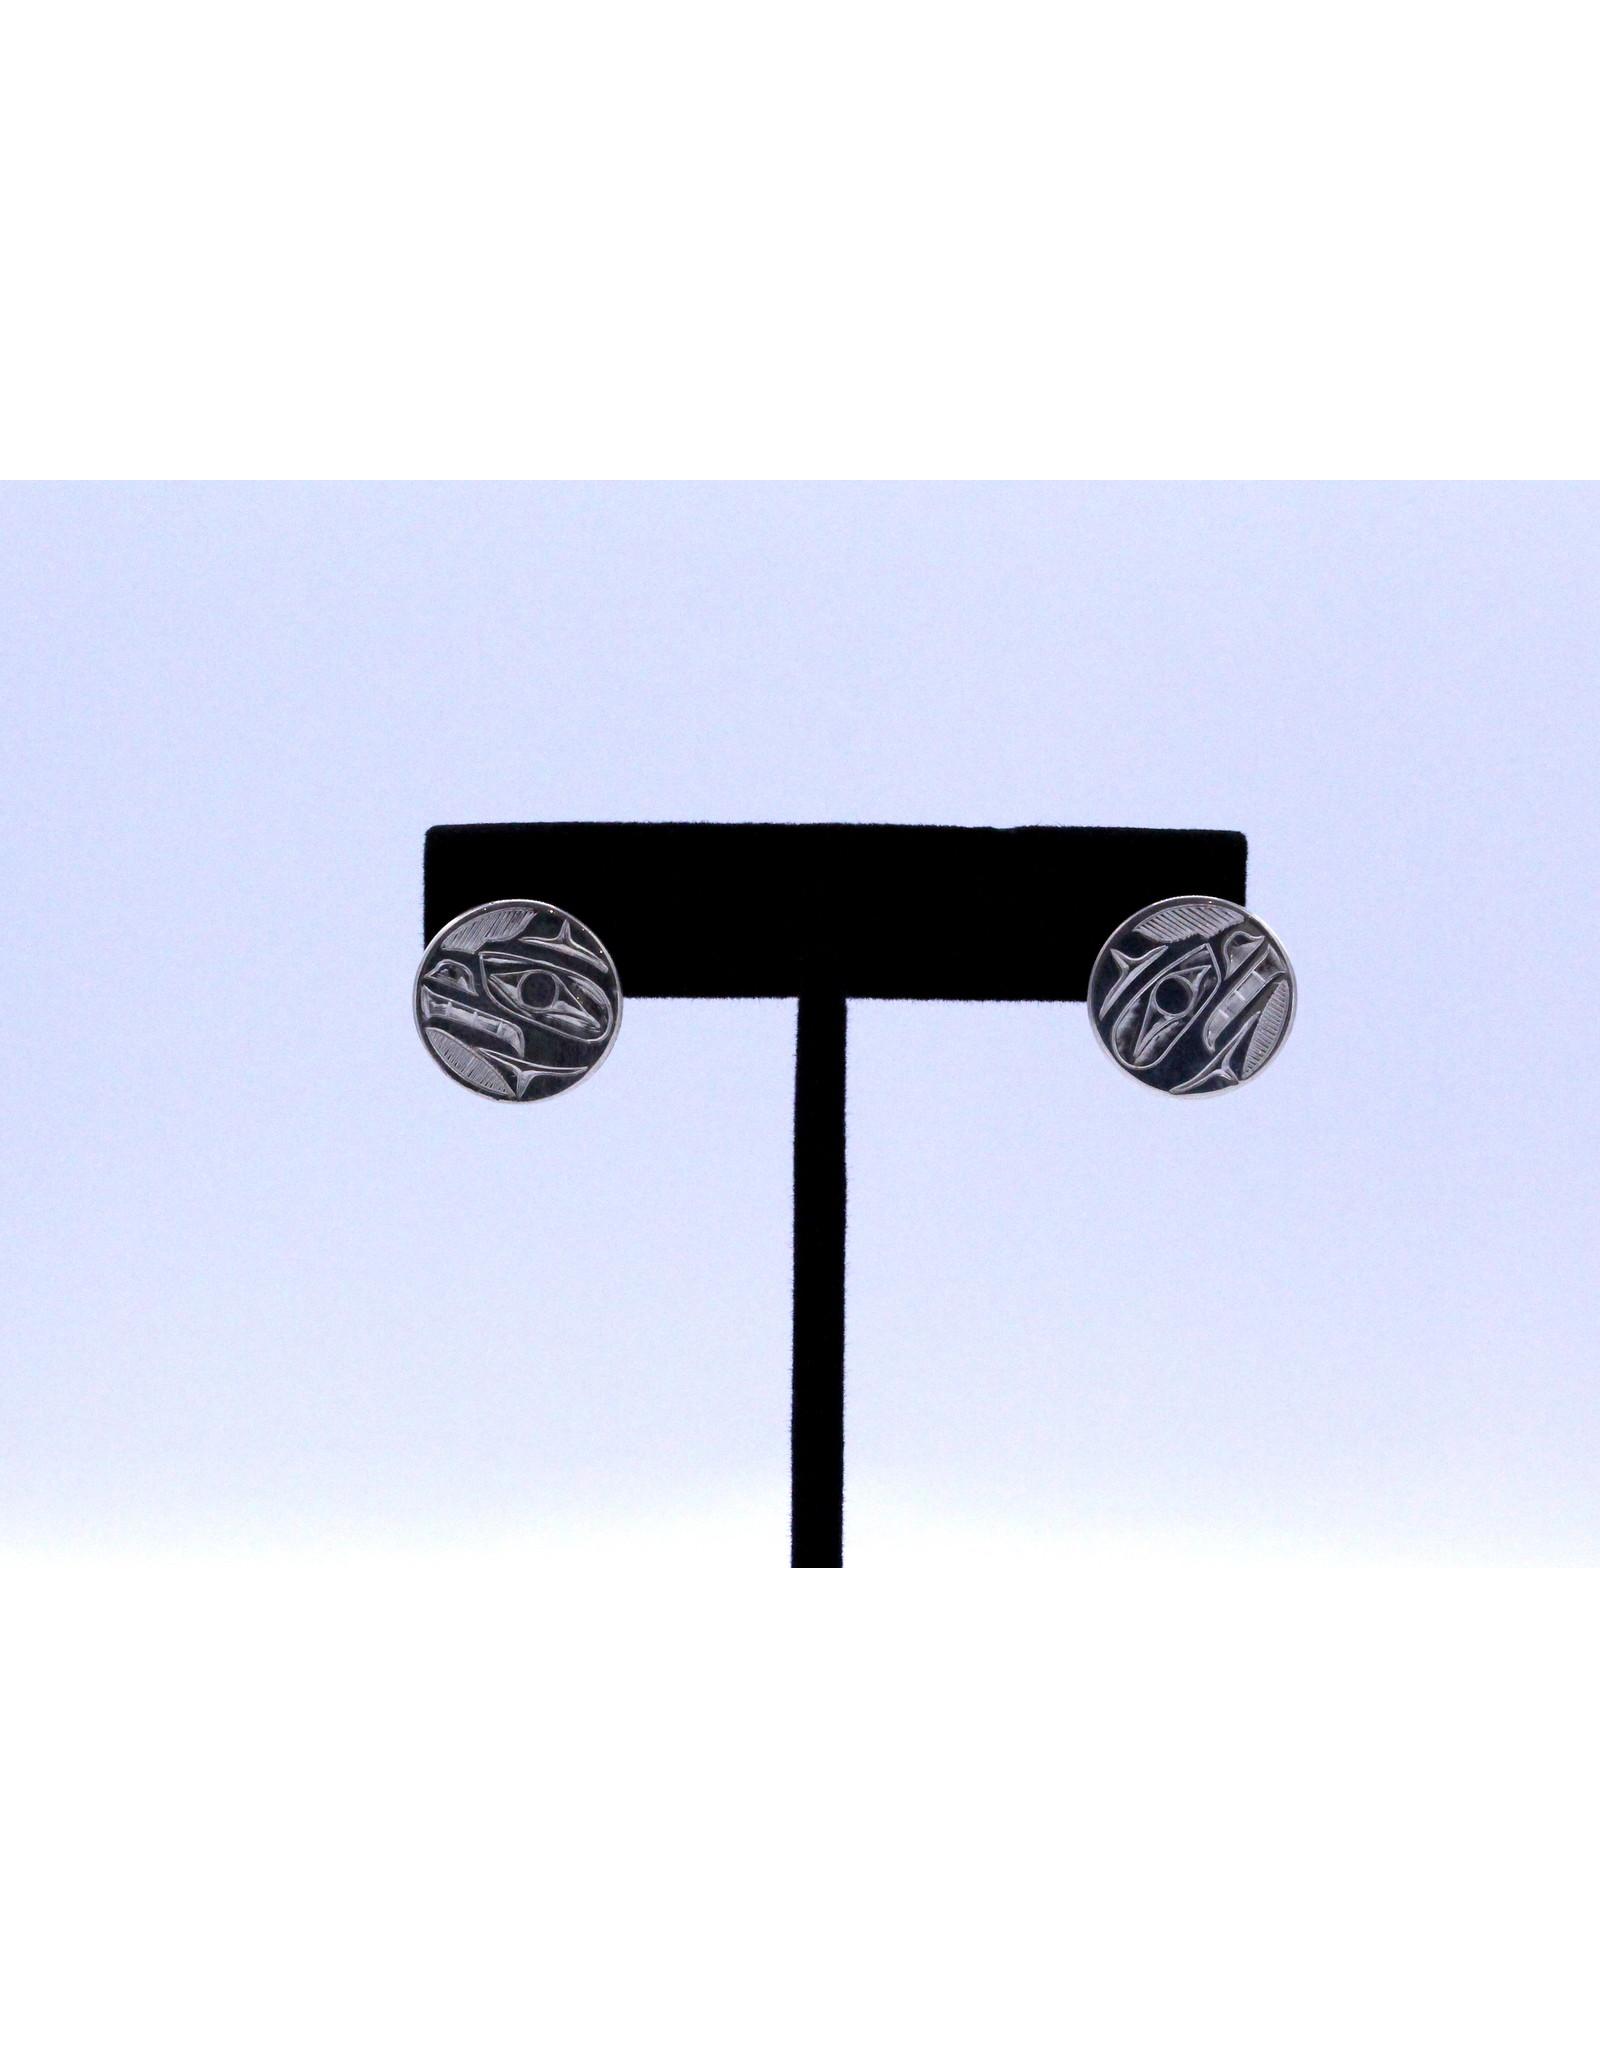 Bear Round Earrings by Nusmata - NRE01